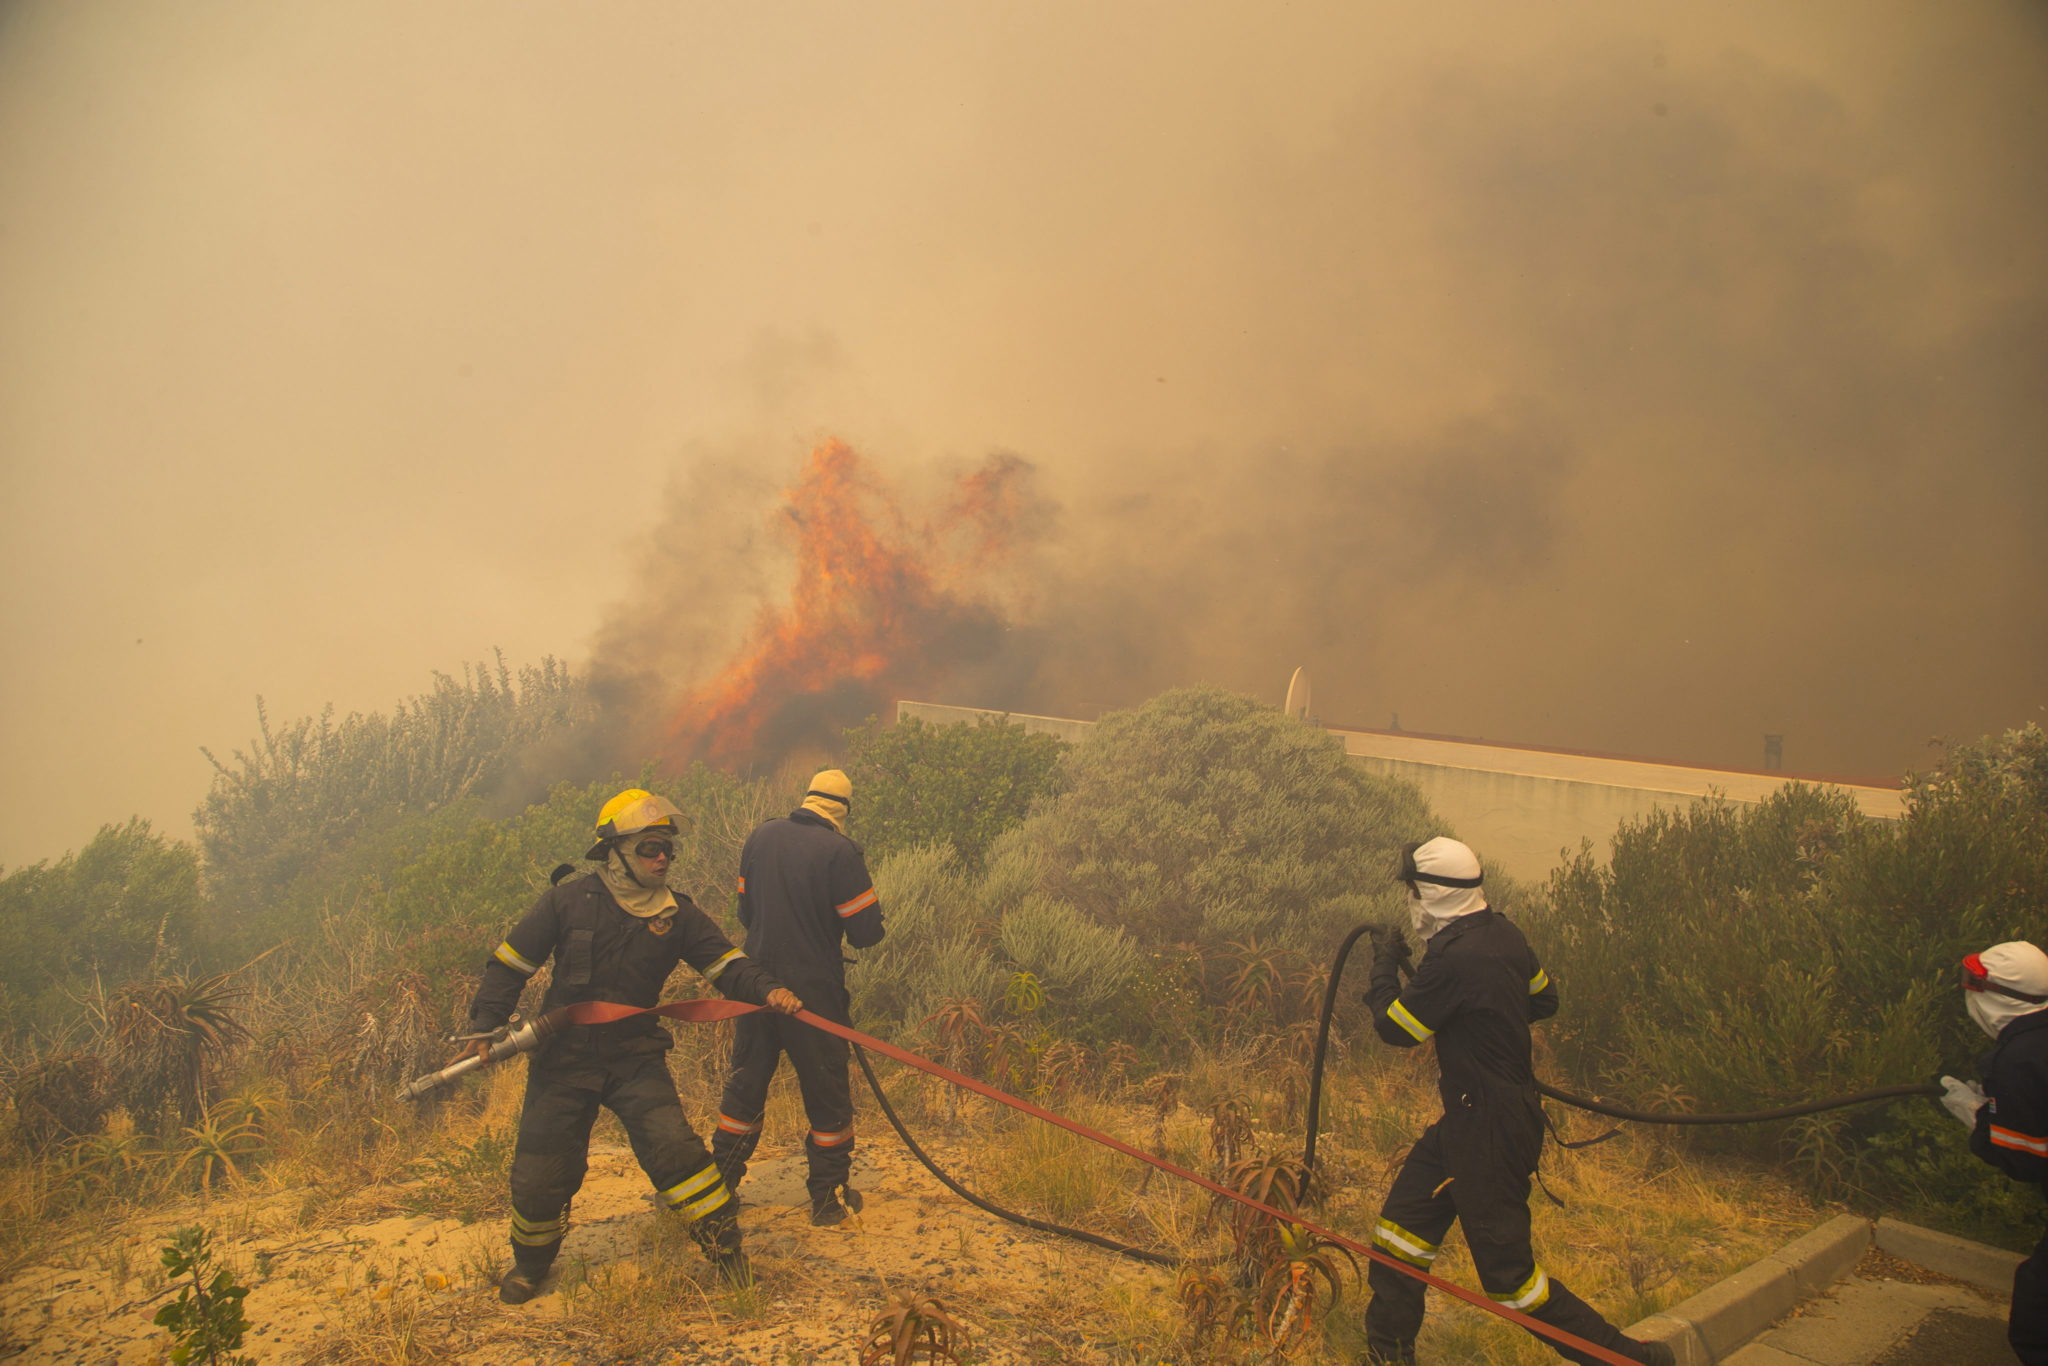 fot. PAP/EPA